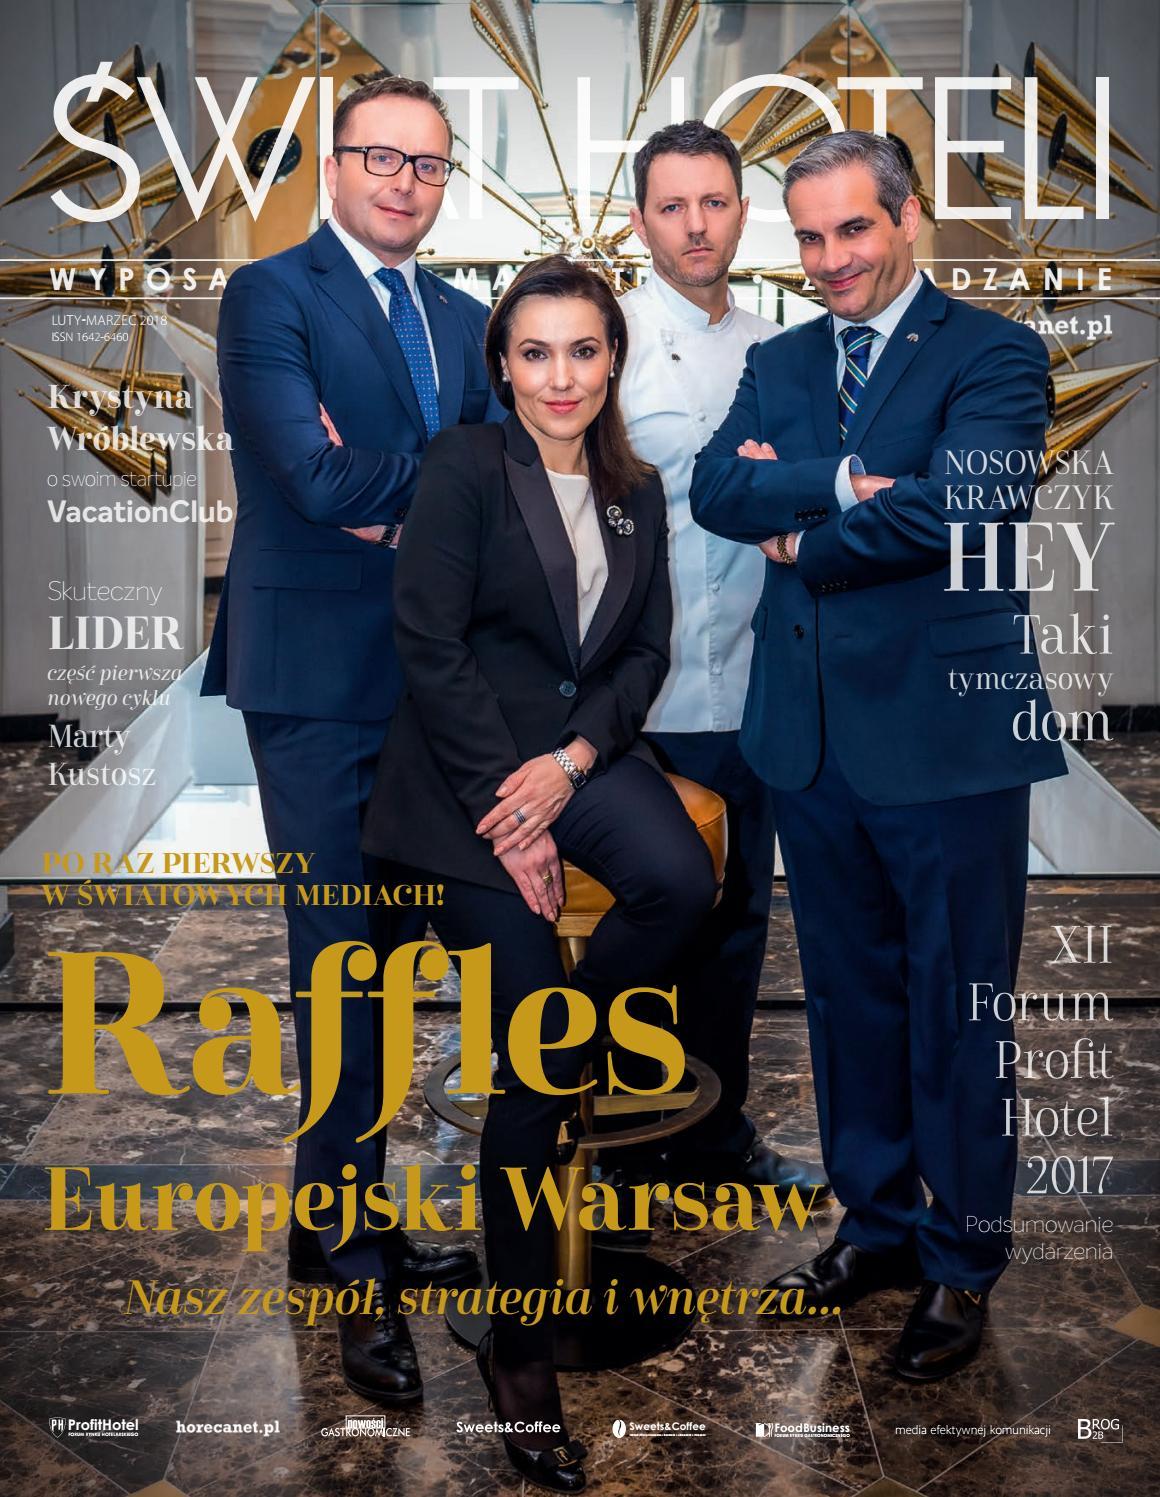 bb568298f4 ŚWIAT HOTELI luty-marzec 2018 by BROG B2B - issuu